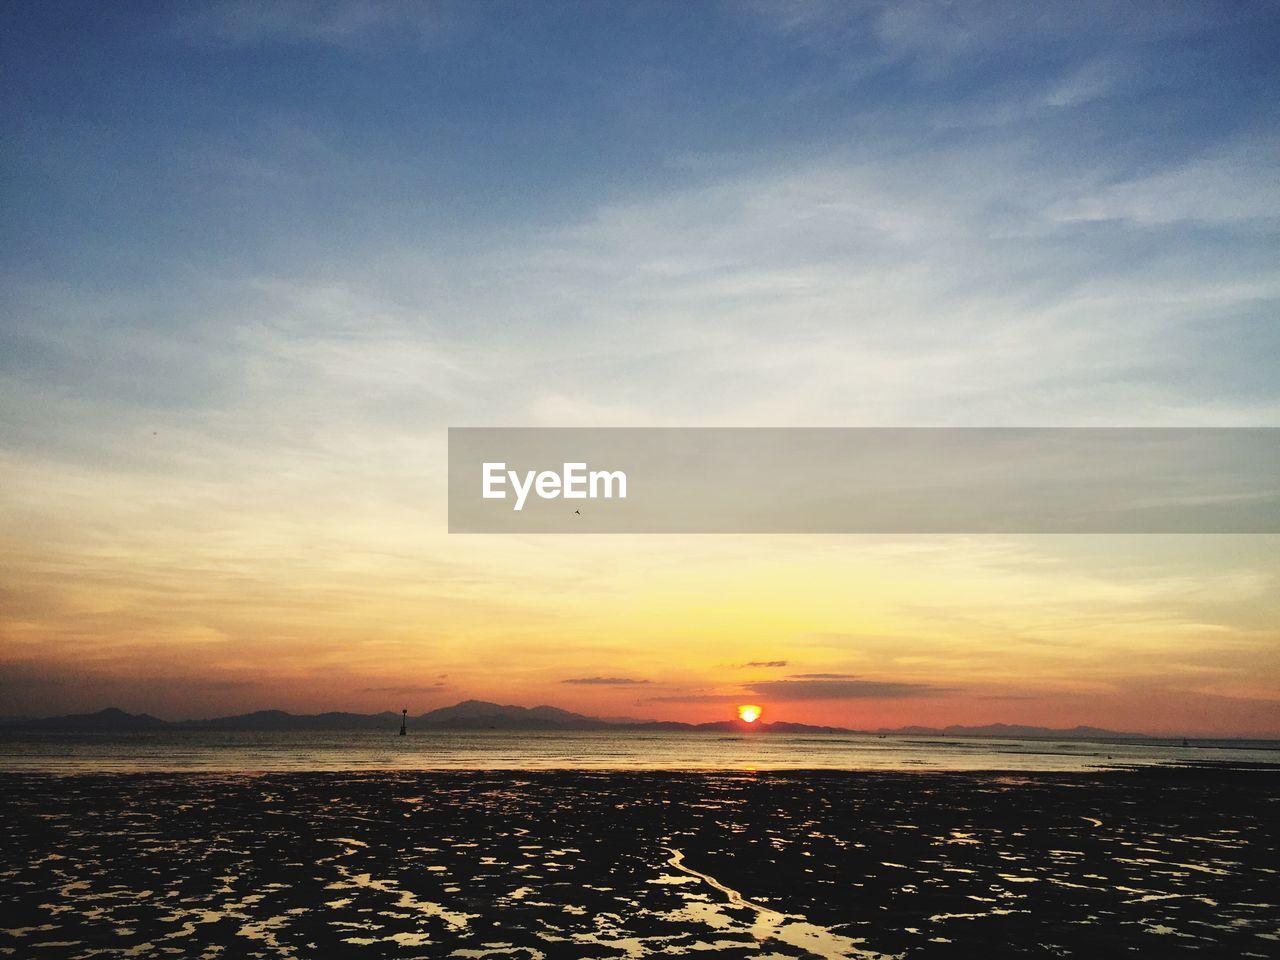 sky, sunset, water, scenics - nature, beauty in nature, sea, cloud - sky, tranquility, tranquil scene, nature, orange color, sun, land, horizon, idyllic, beach, horizon over water, outdoors, silhouette